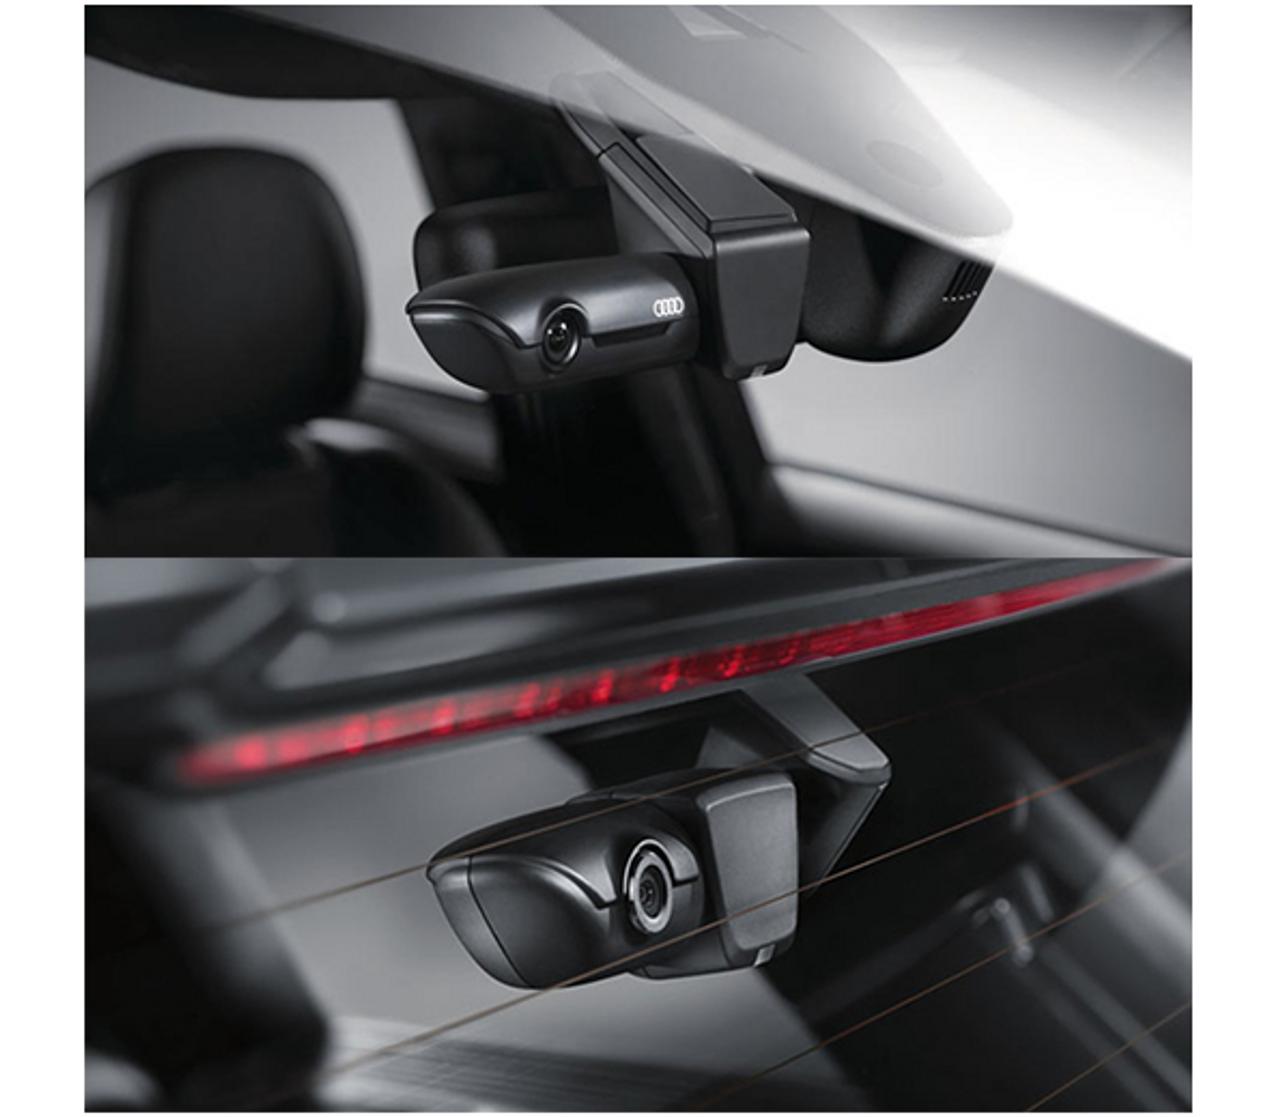 Genuine Audi Dual UTR Camera Universal Traffic Recorder  Dash Cam 4G0063511H (including wiring kit)